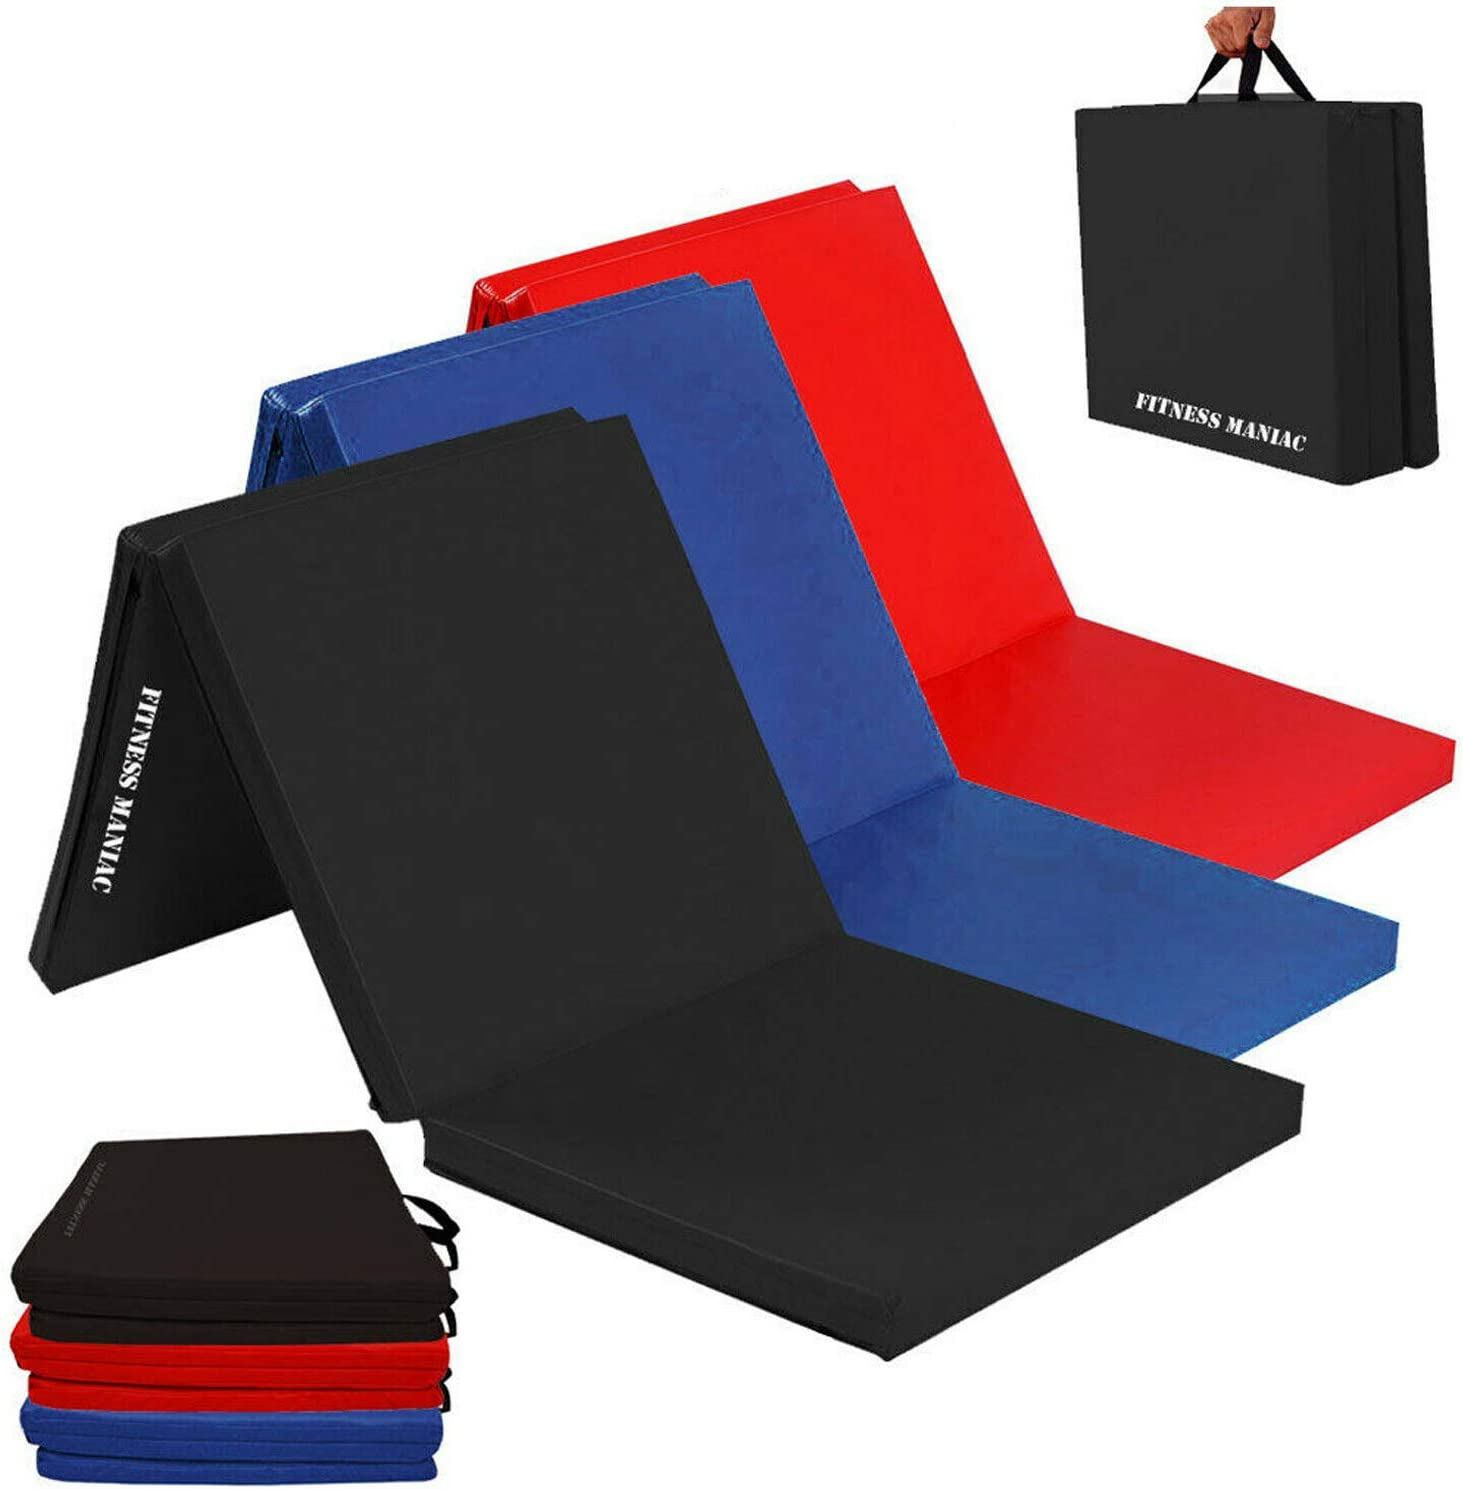 Bargain FITNESS MANIAC Popular products Black Folding Mat Aerobics Exercise Panel Tumblin